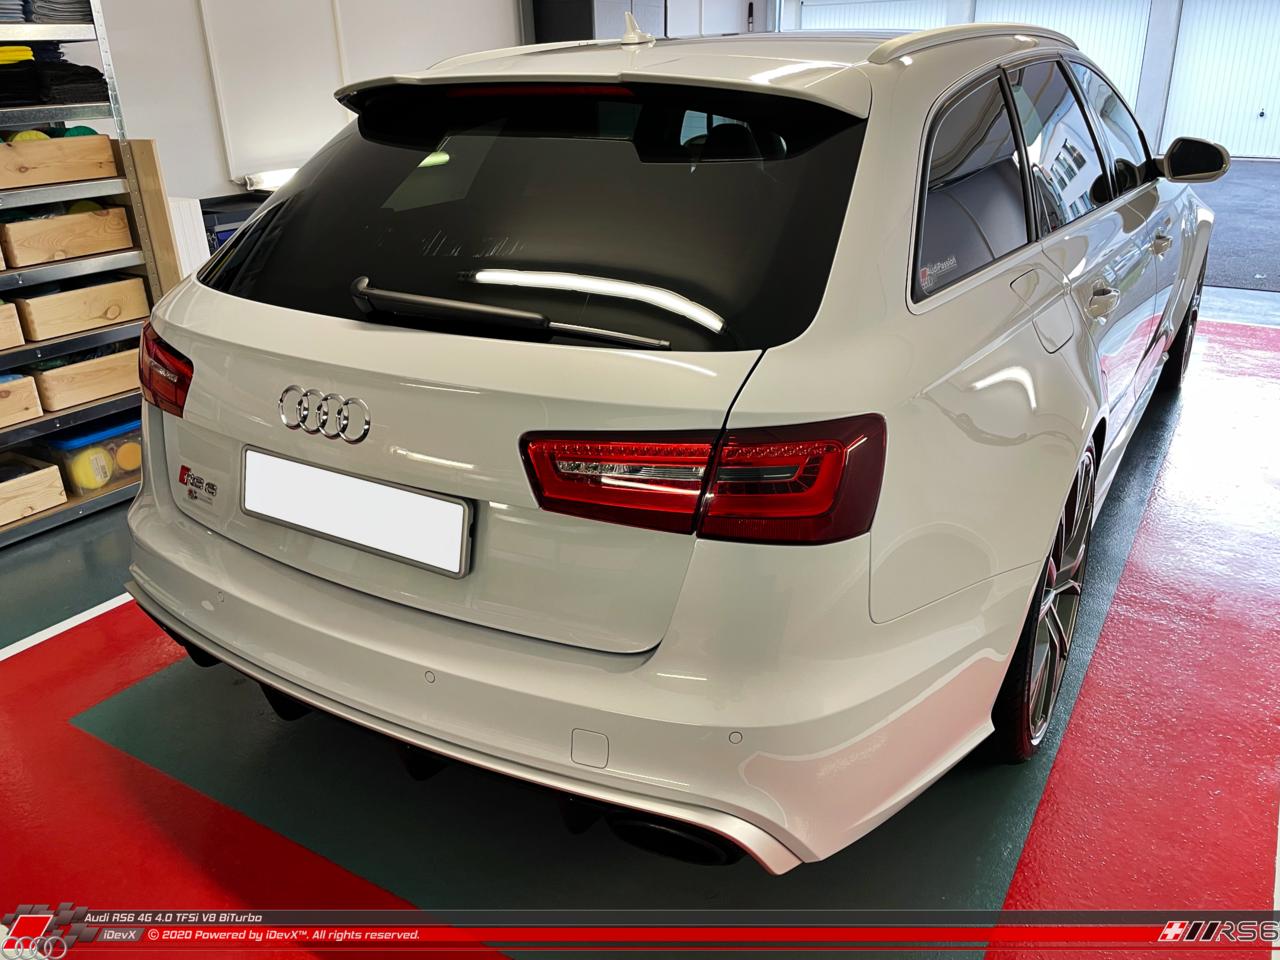 19.02.2021_Audi-RS6_iDevX_004.png